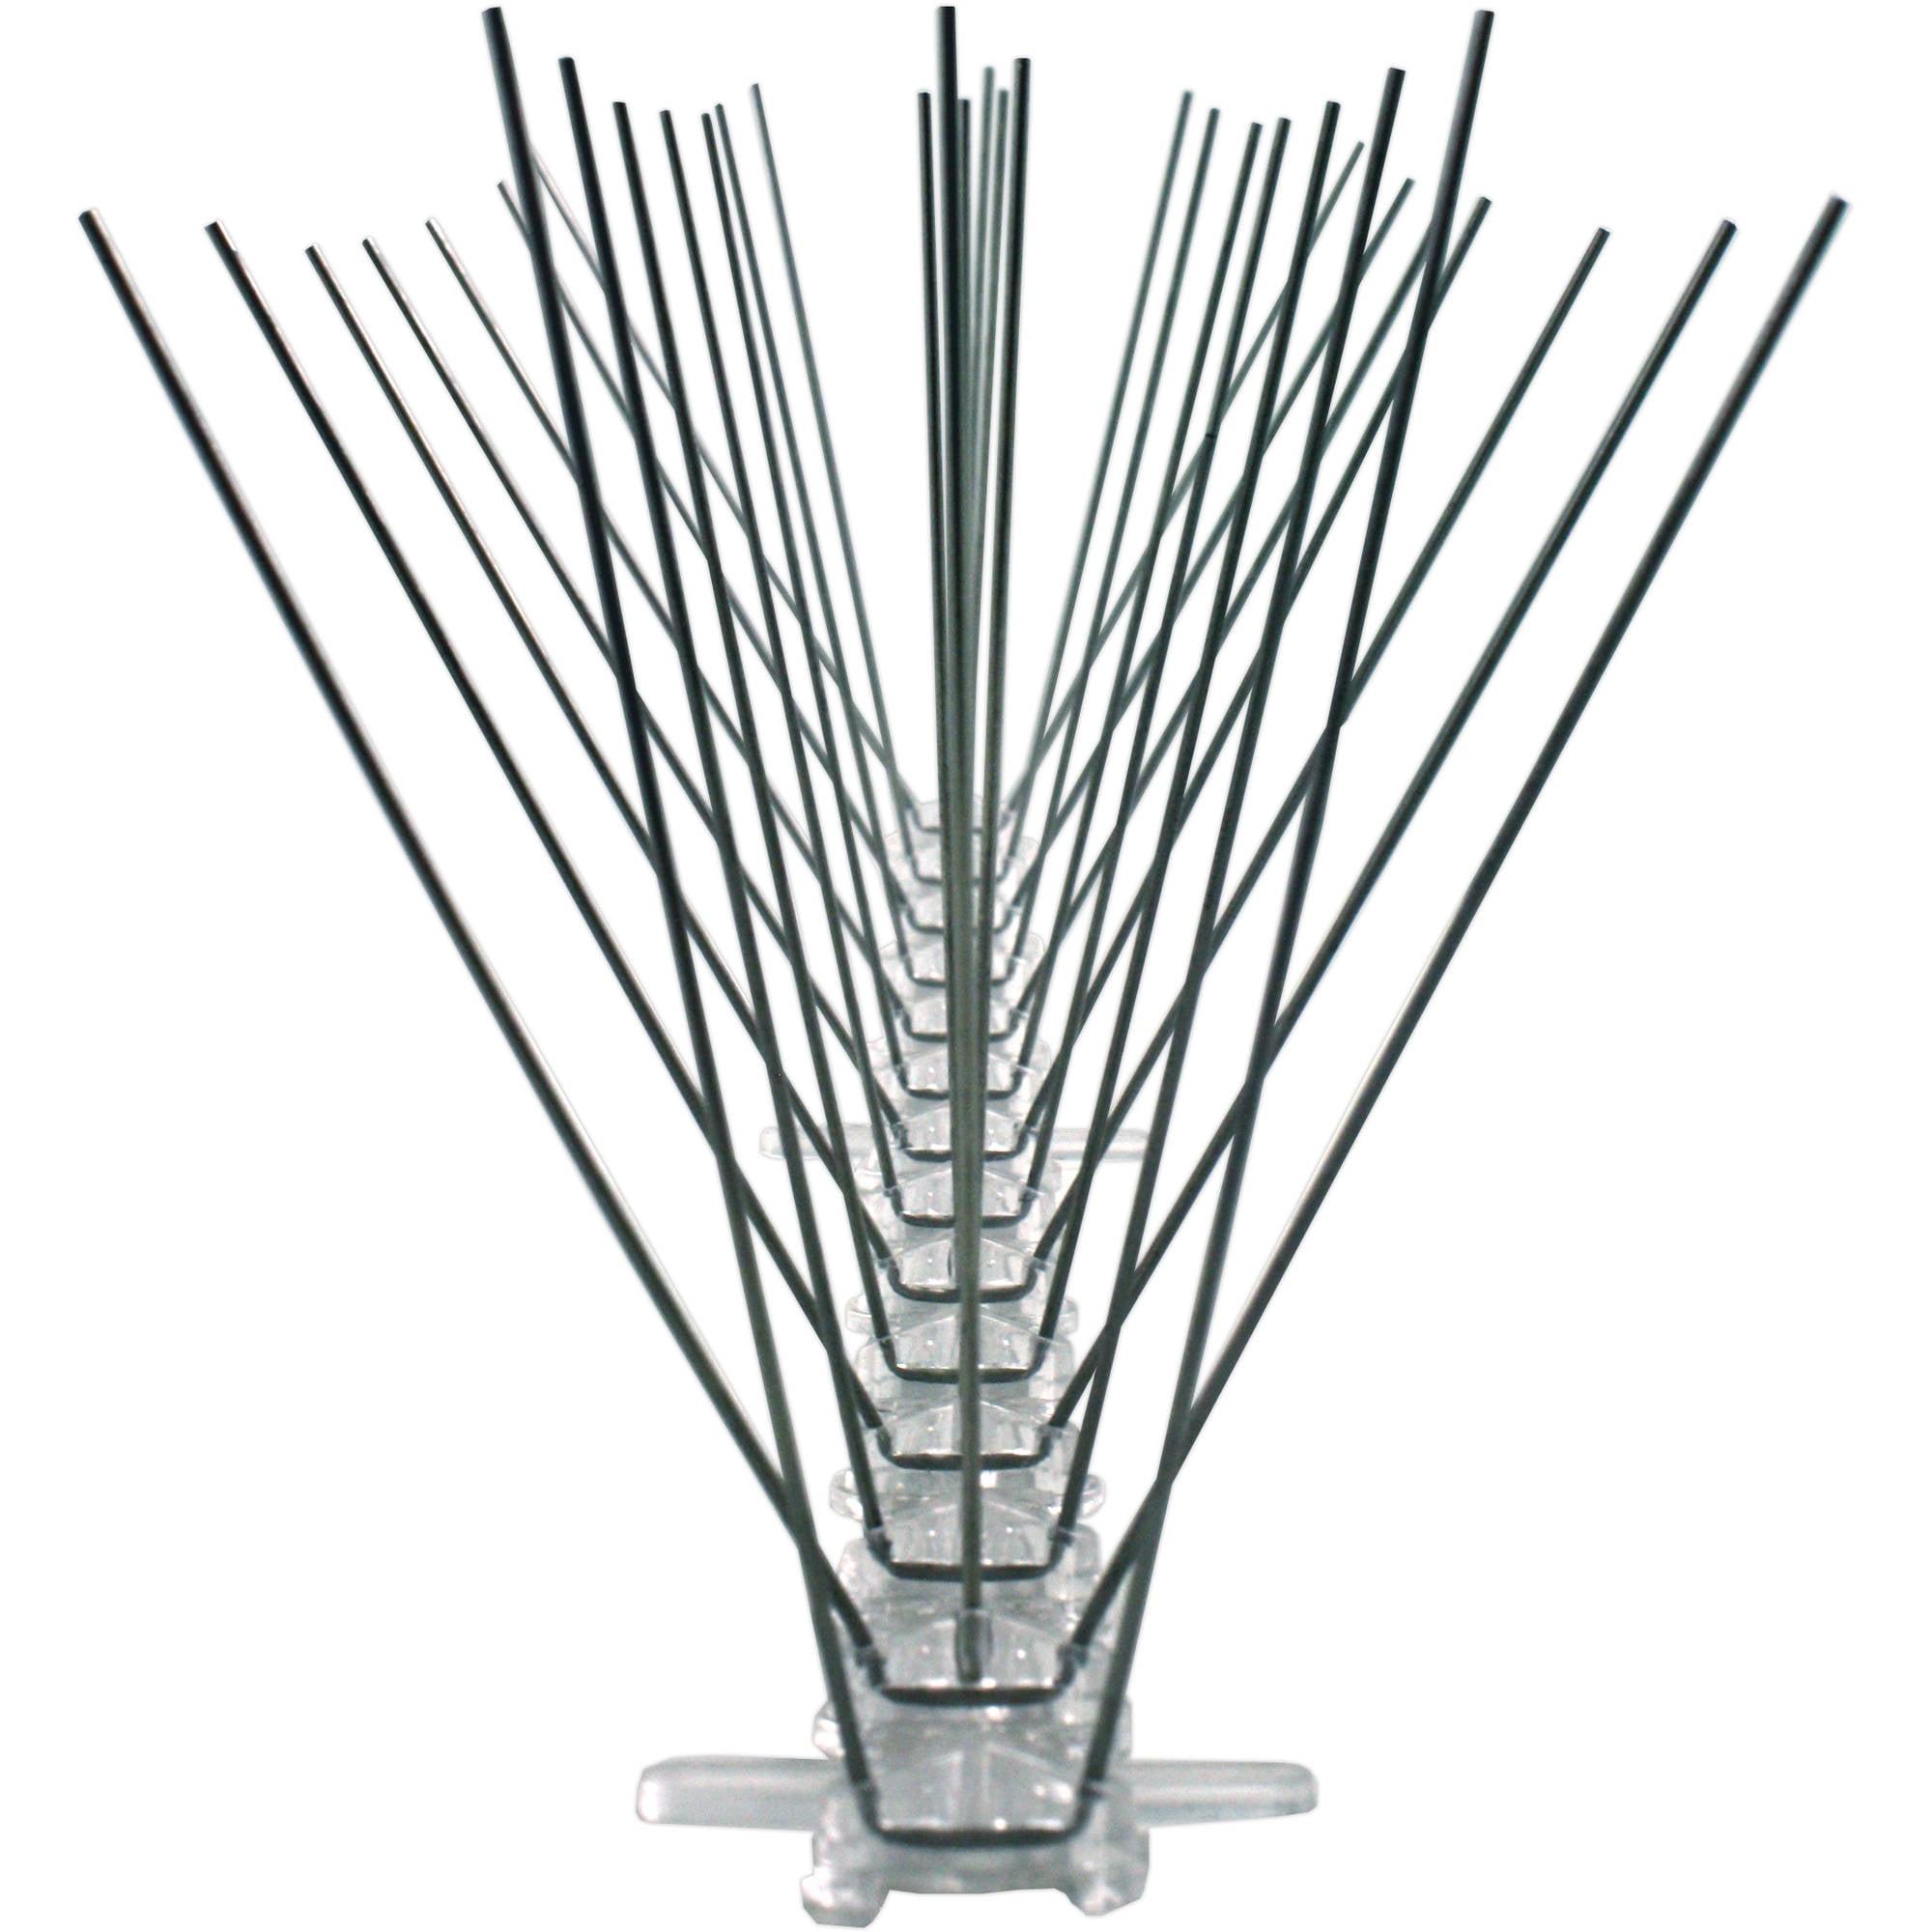 Bird X Stainless Steel Bird Spikes 50